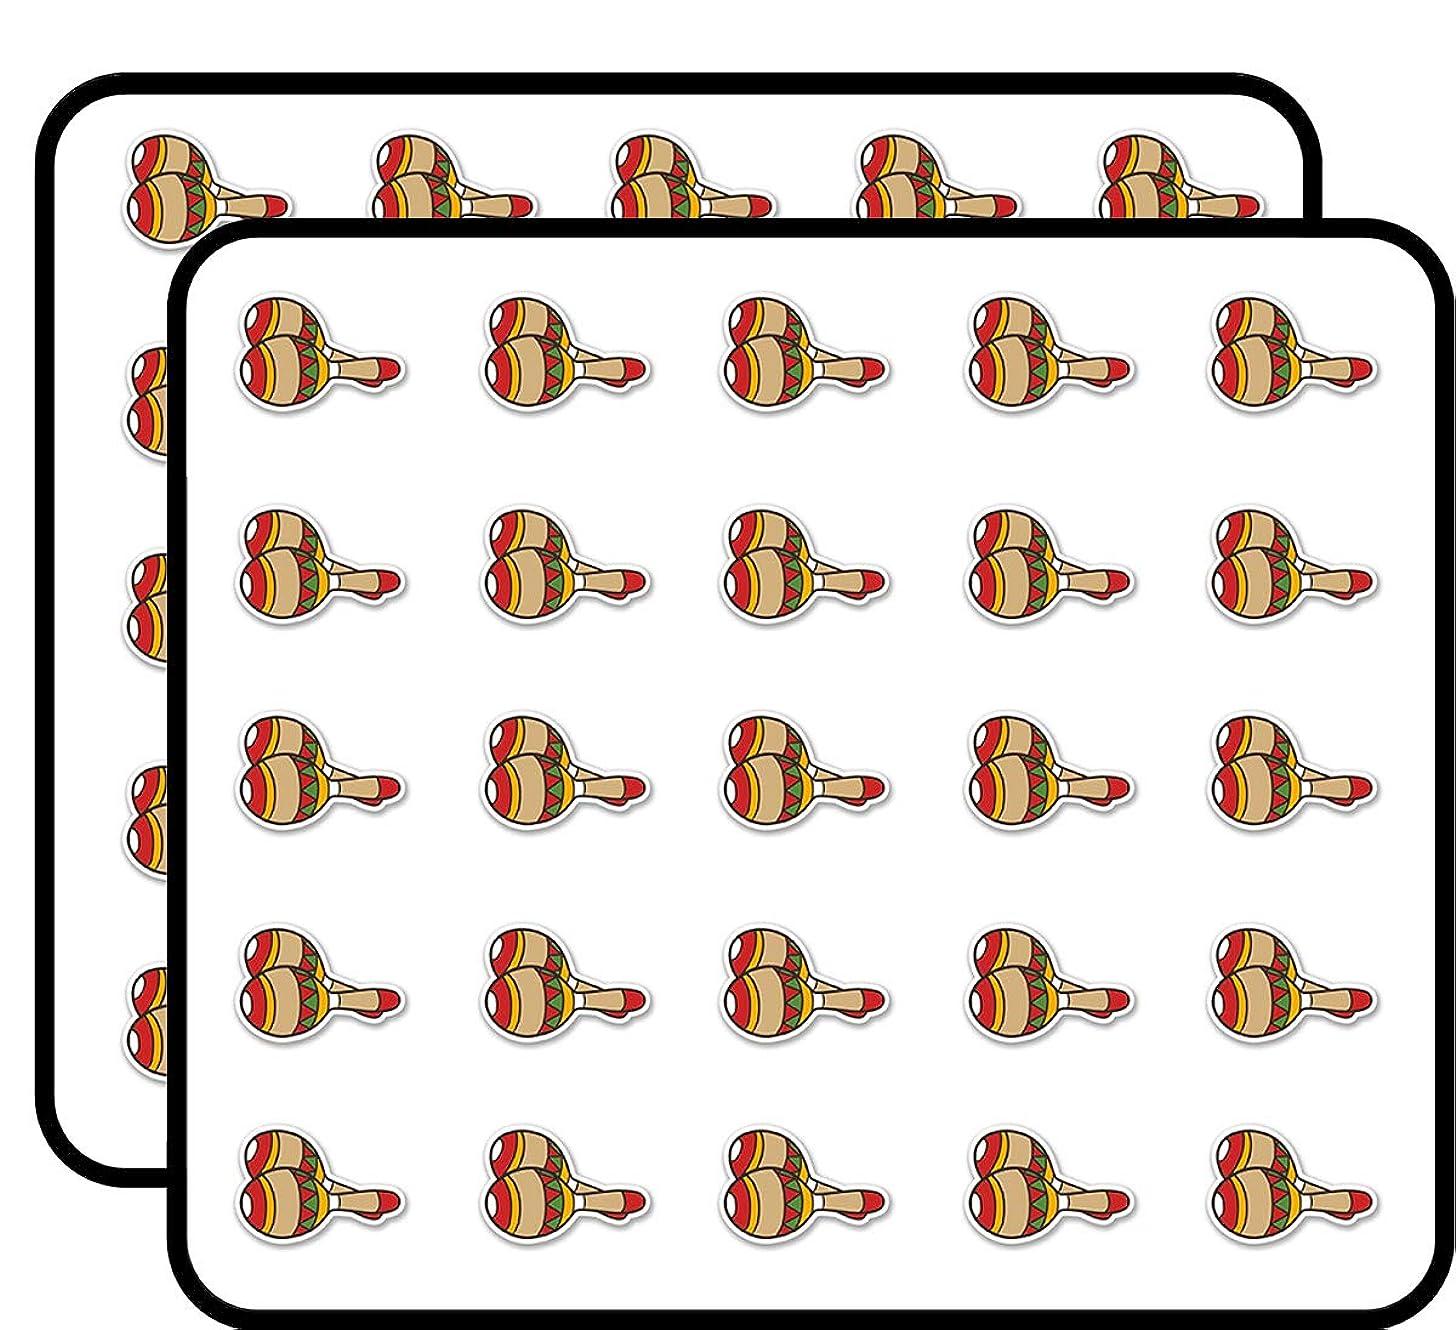 Mexican Maracas Sticker for Scrapbooking, Calendars, Arts, Kids DIY Crafts, Album, Bullet Journals 50 Pack